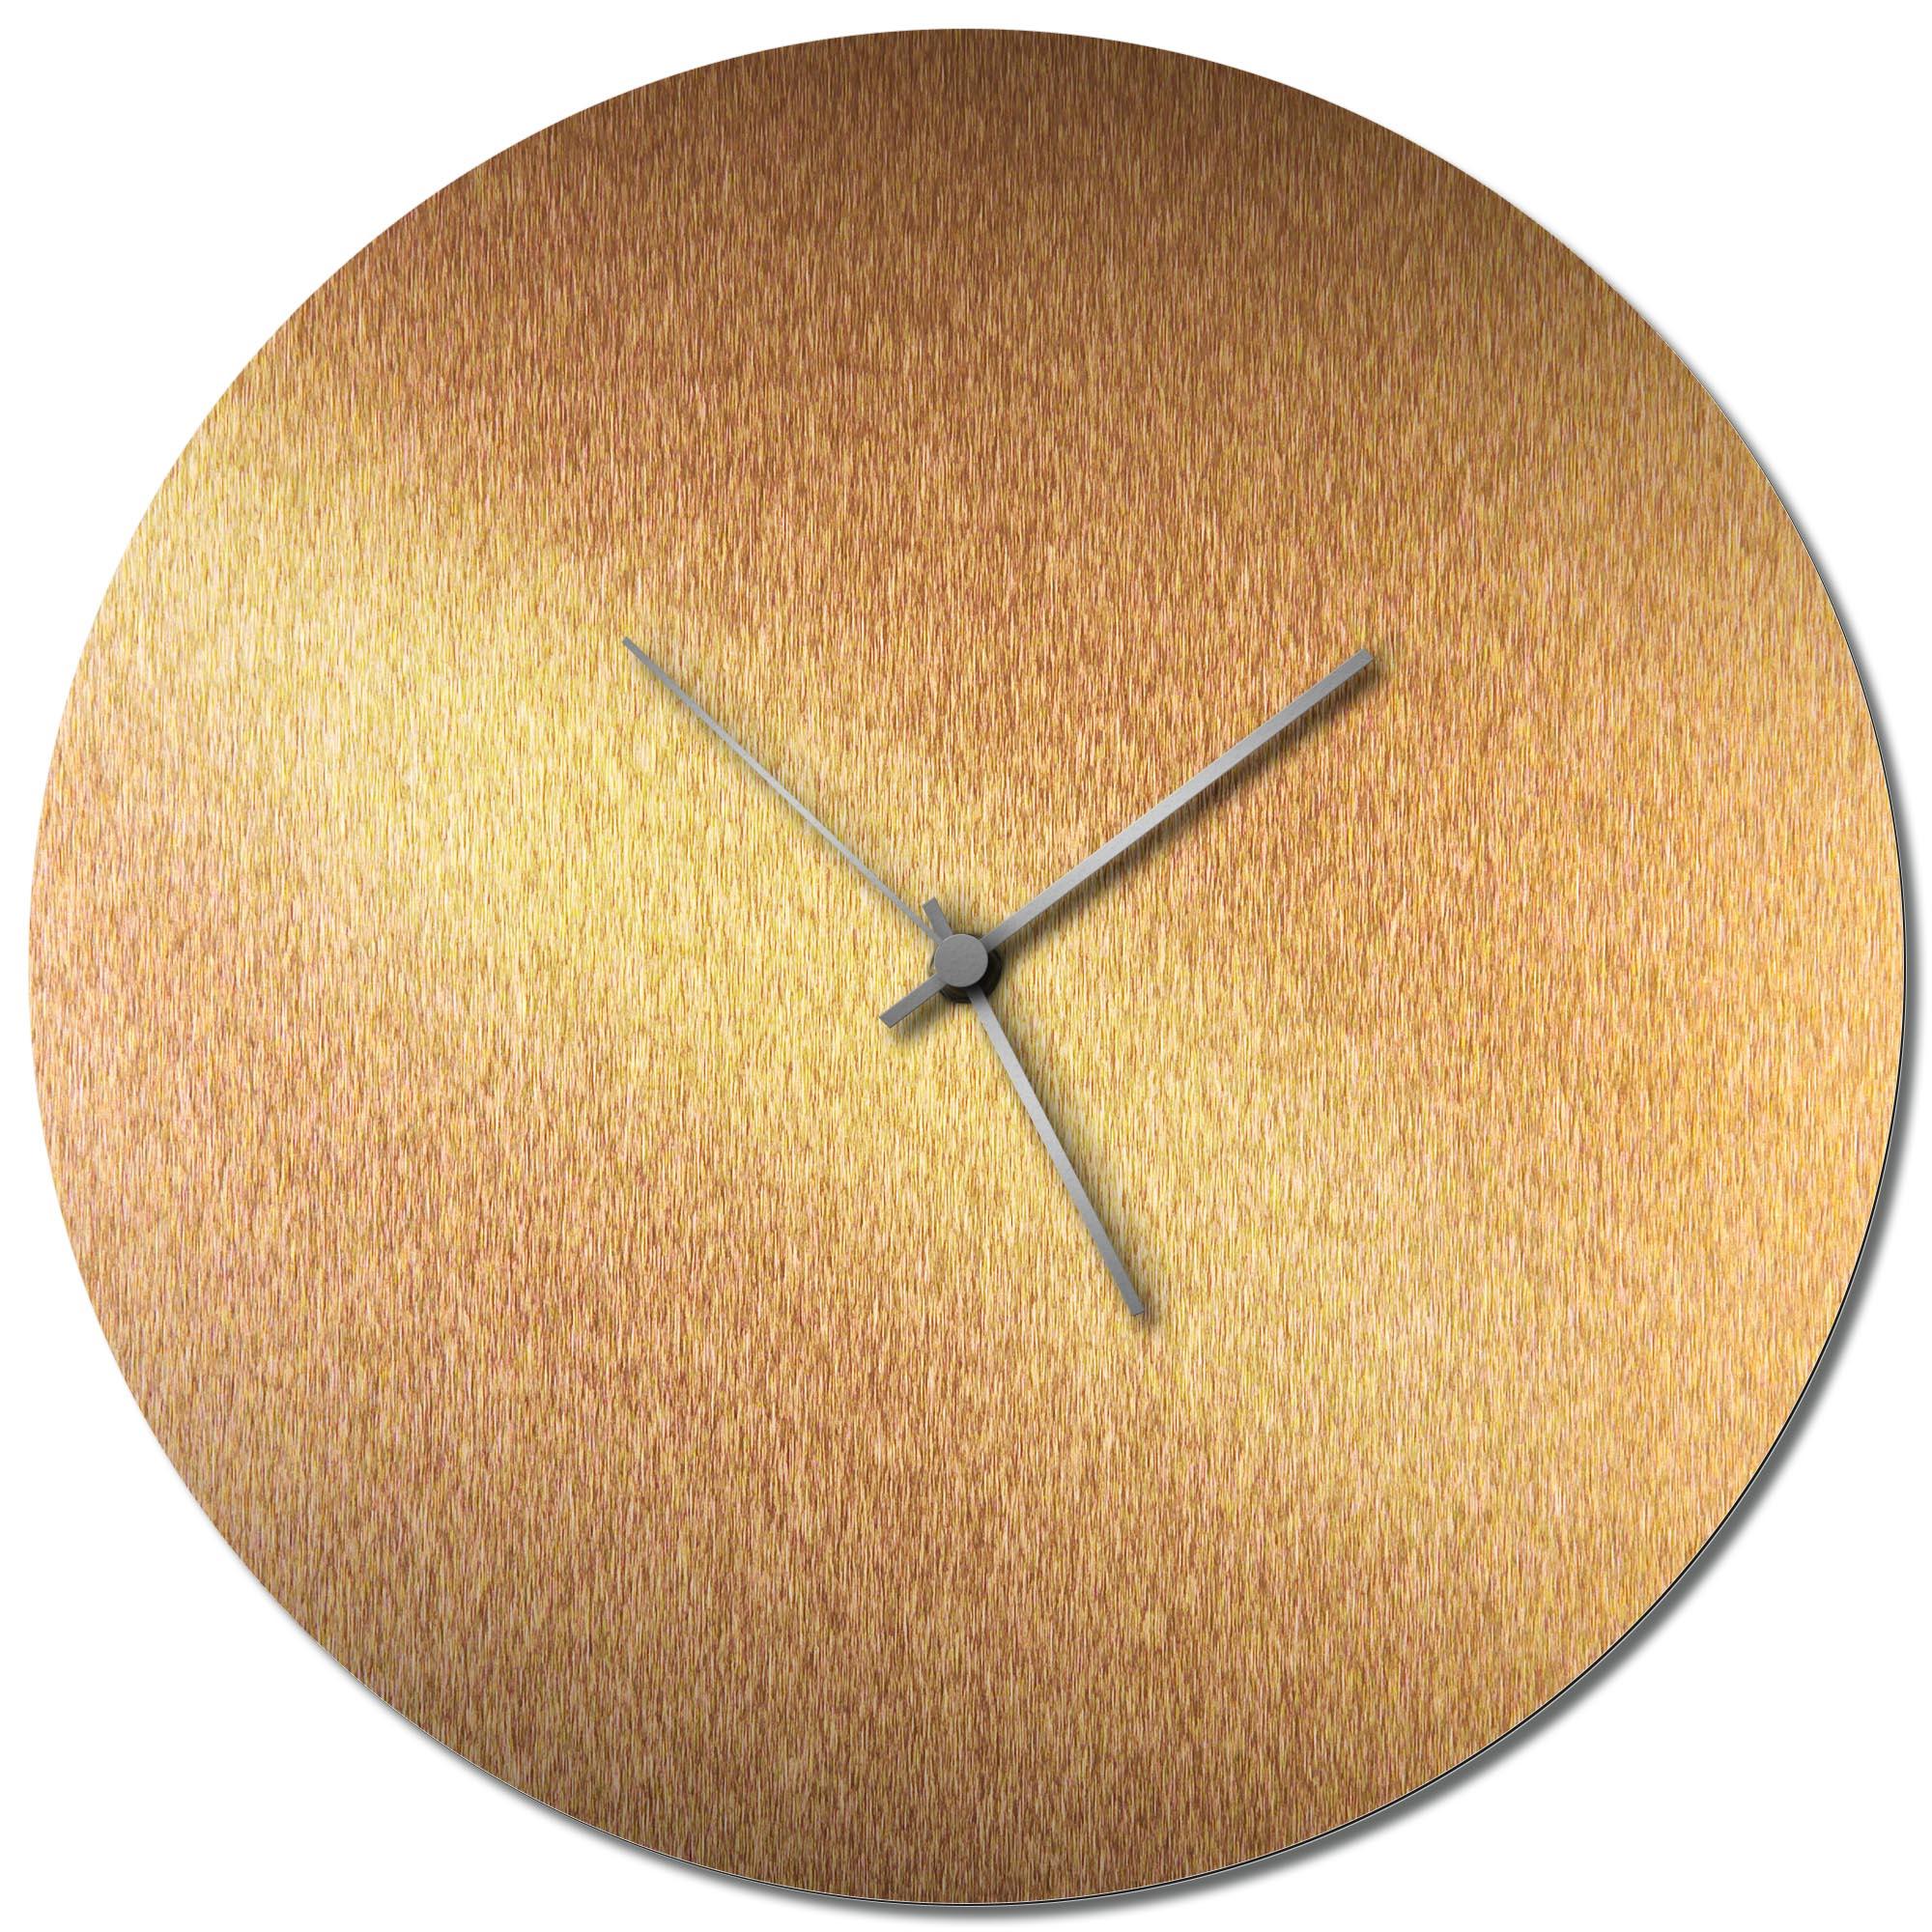 Adam Schwoeppe 'Bronzesmith Circle Clock Large Silver' Midcentury Modern Style Wall Clock